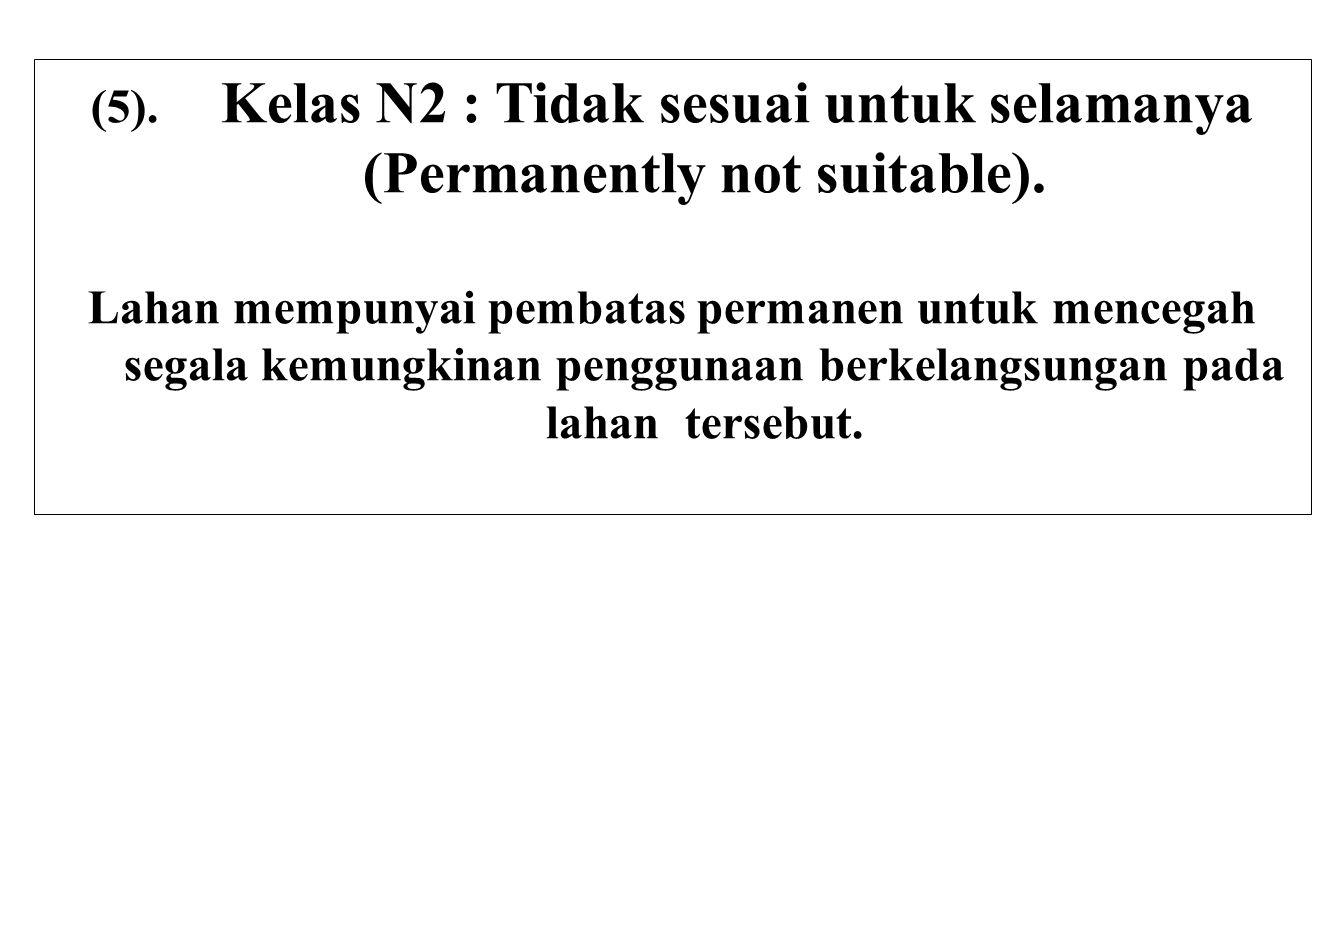 (5). Kelas N2 : Tidak sesuai untuk selamanya (Permanently not suitable).